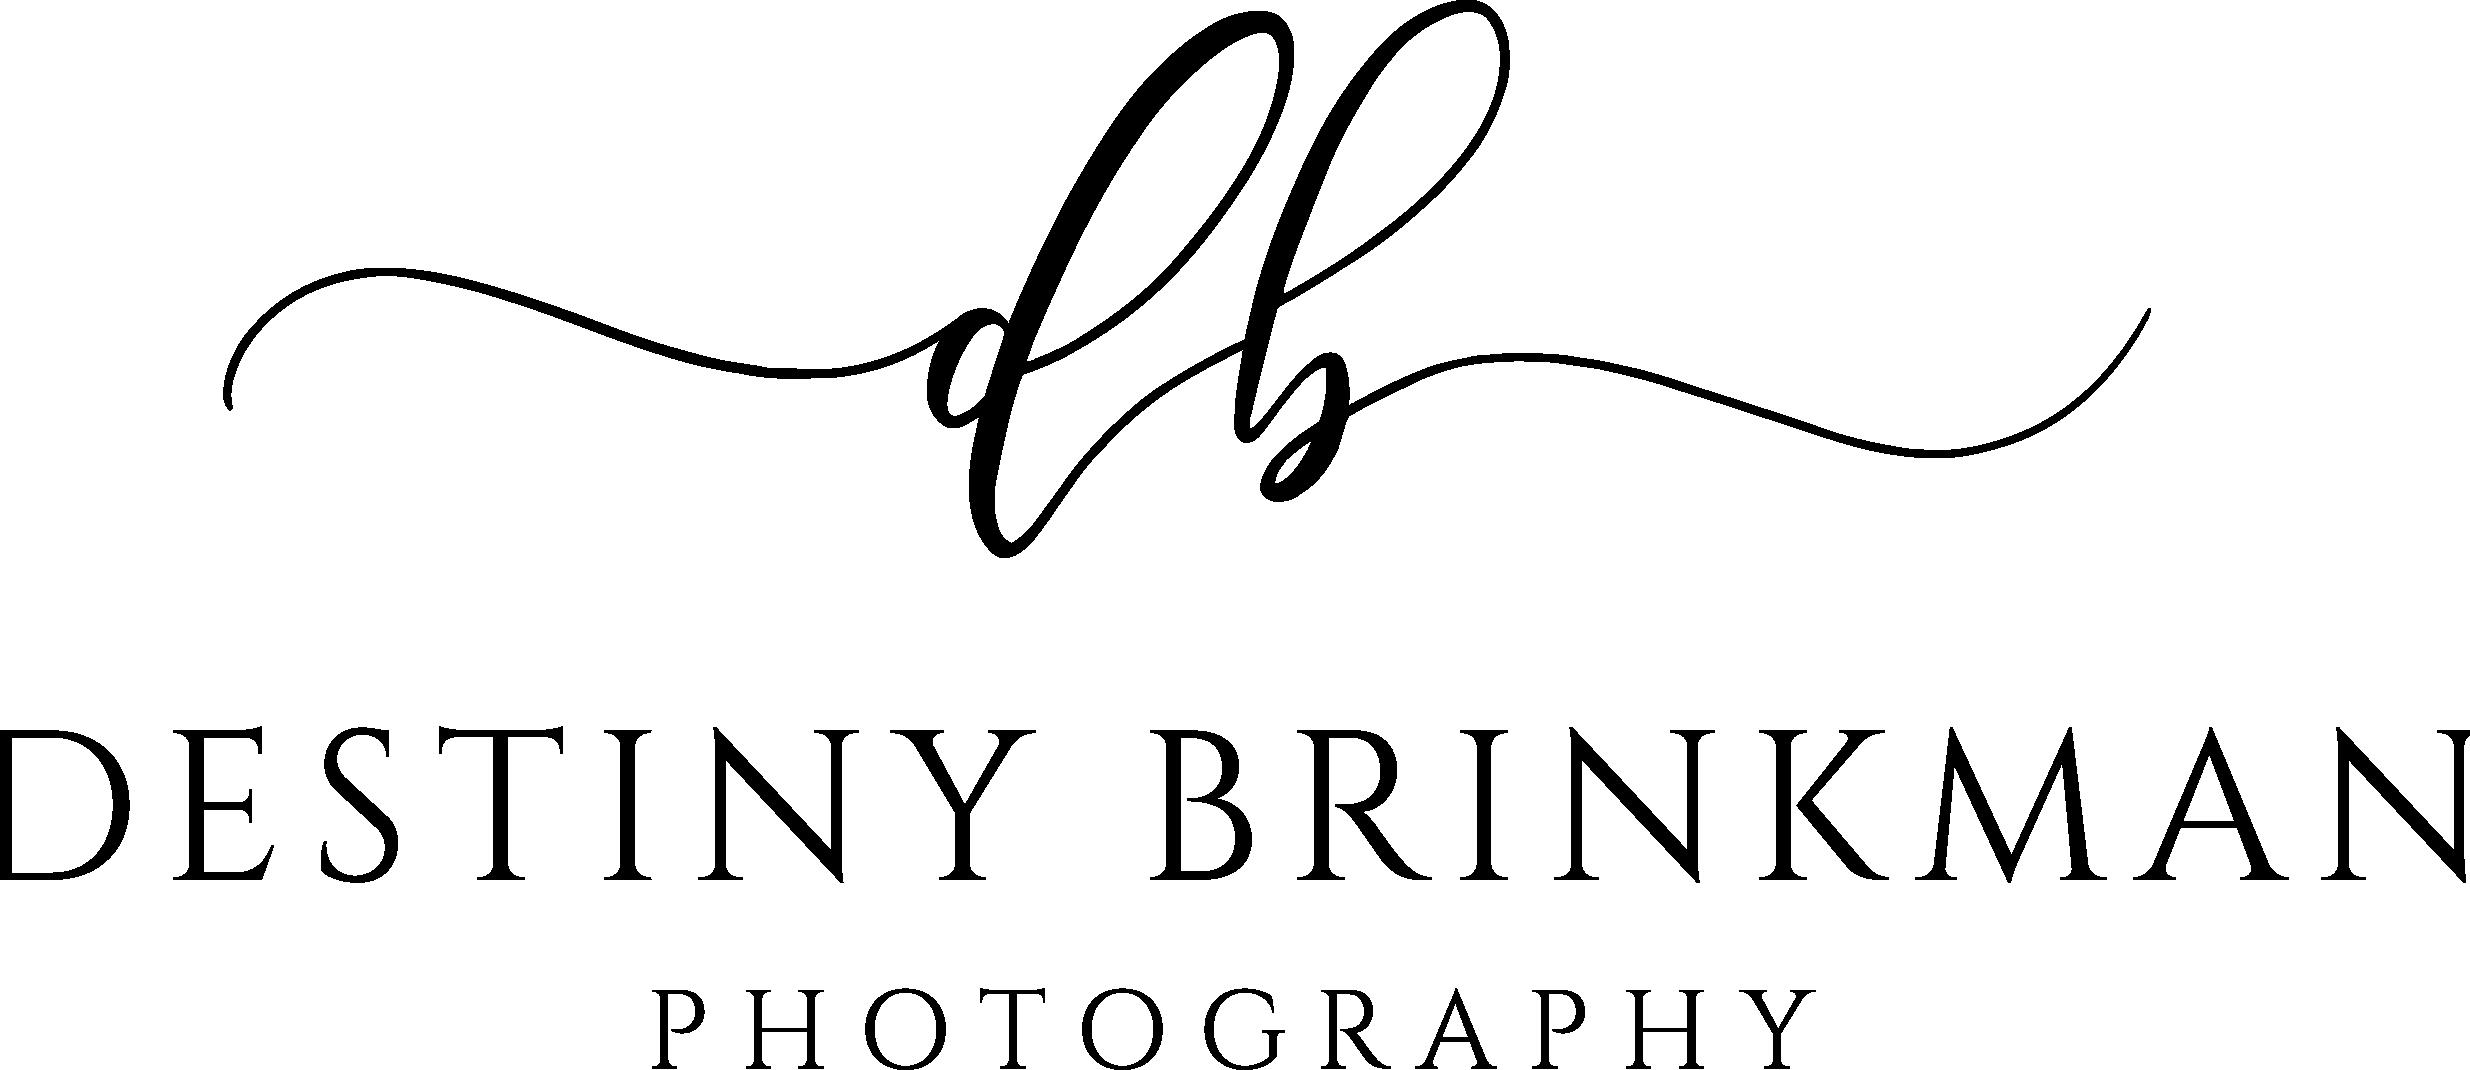 Destiny Brinkman